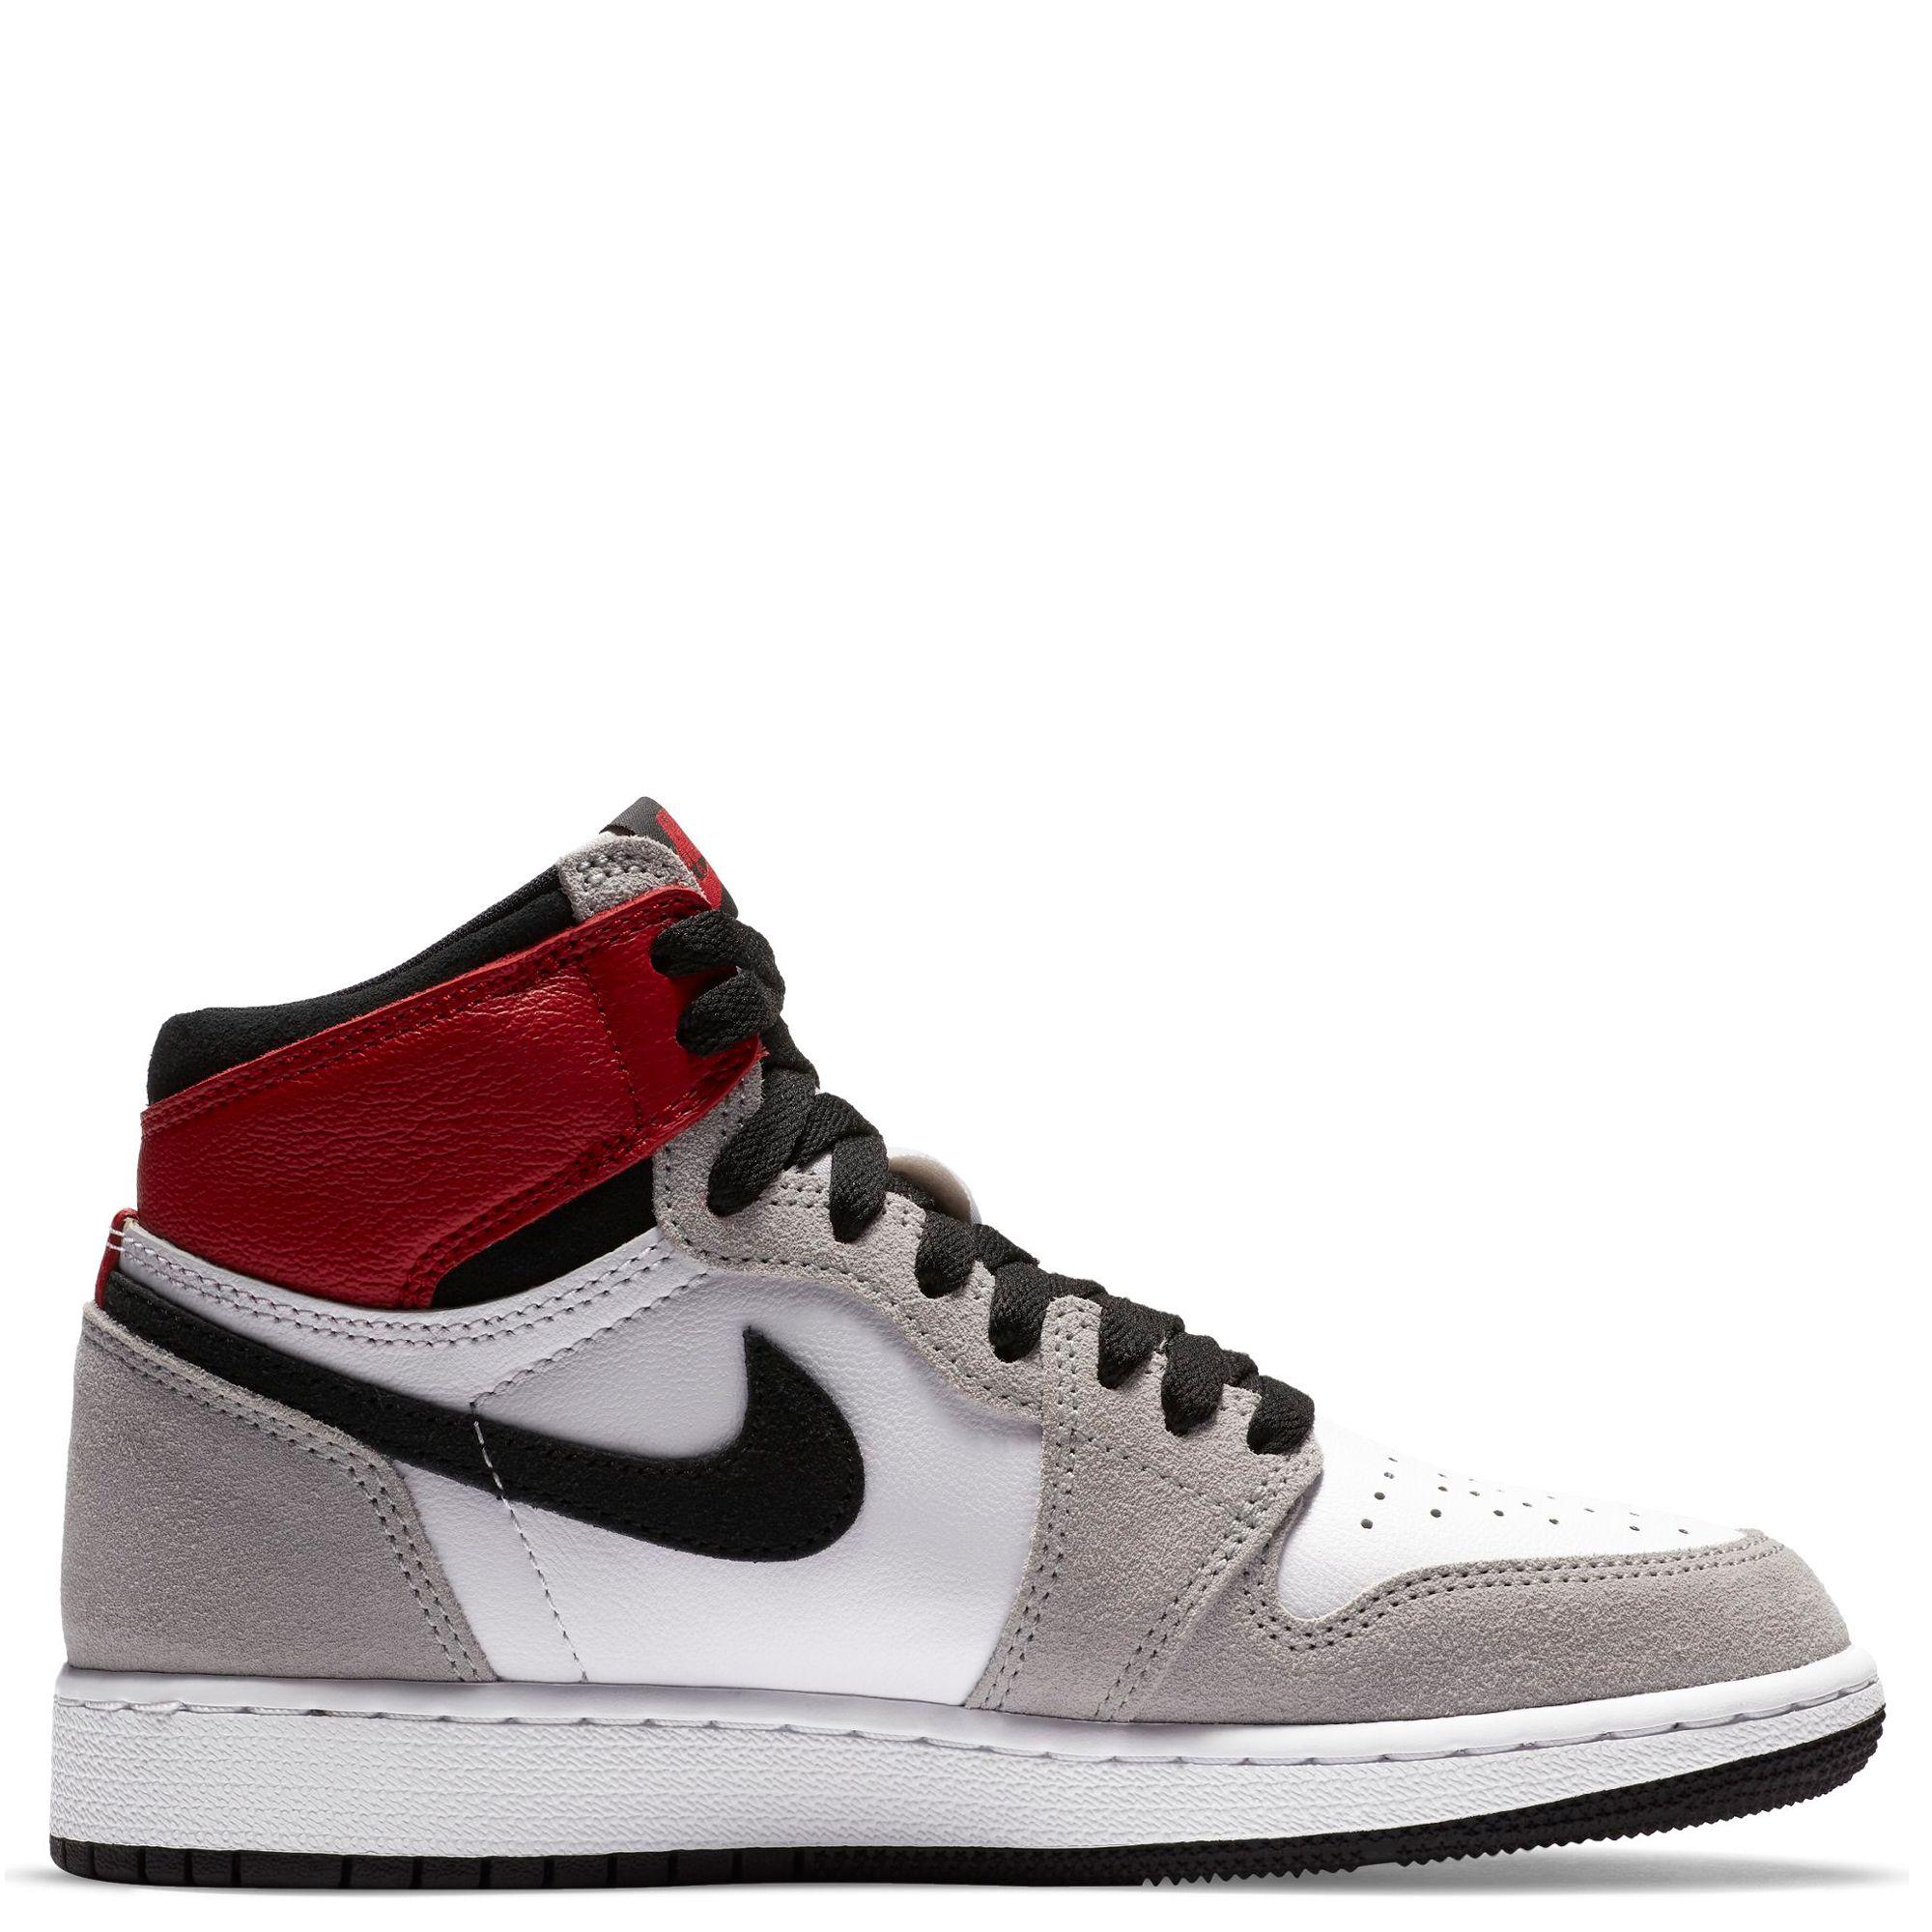 Gs Air Jordan 1 Retro High Og